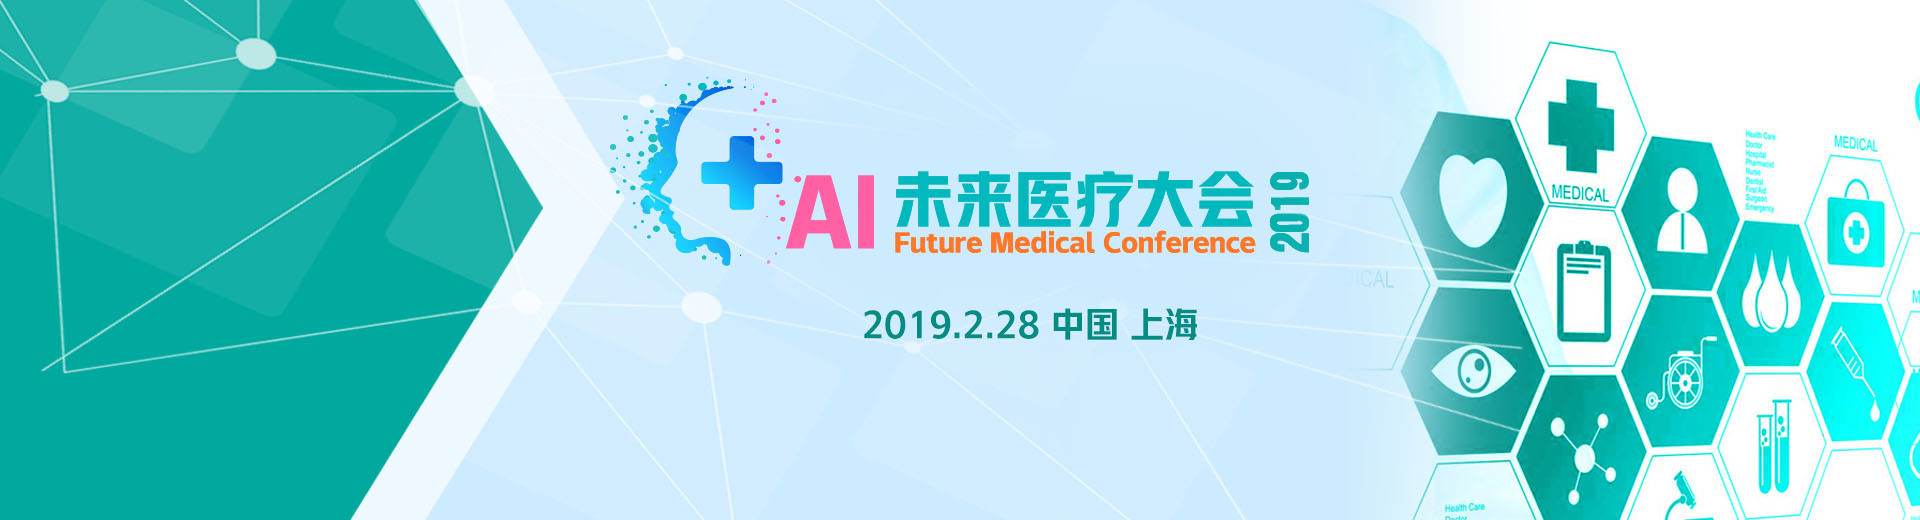 AI 未来医疗大会2019.2.28上海